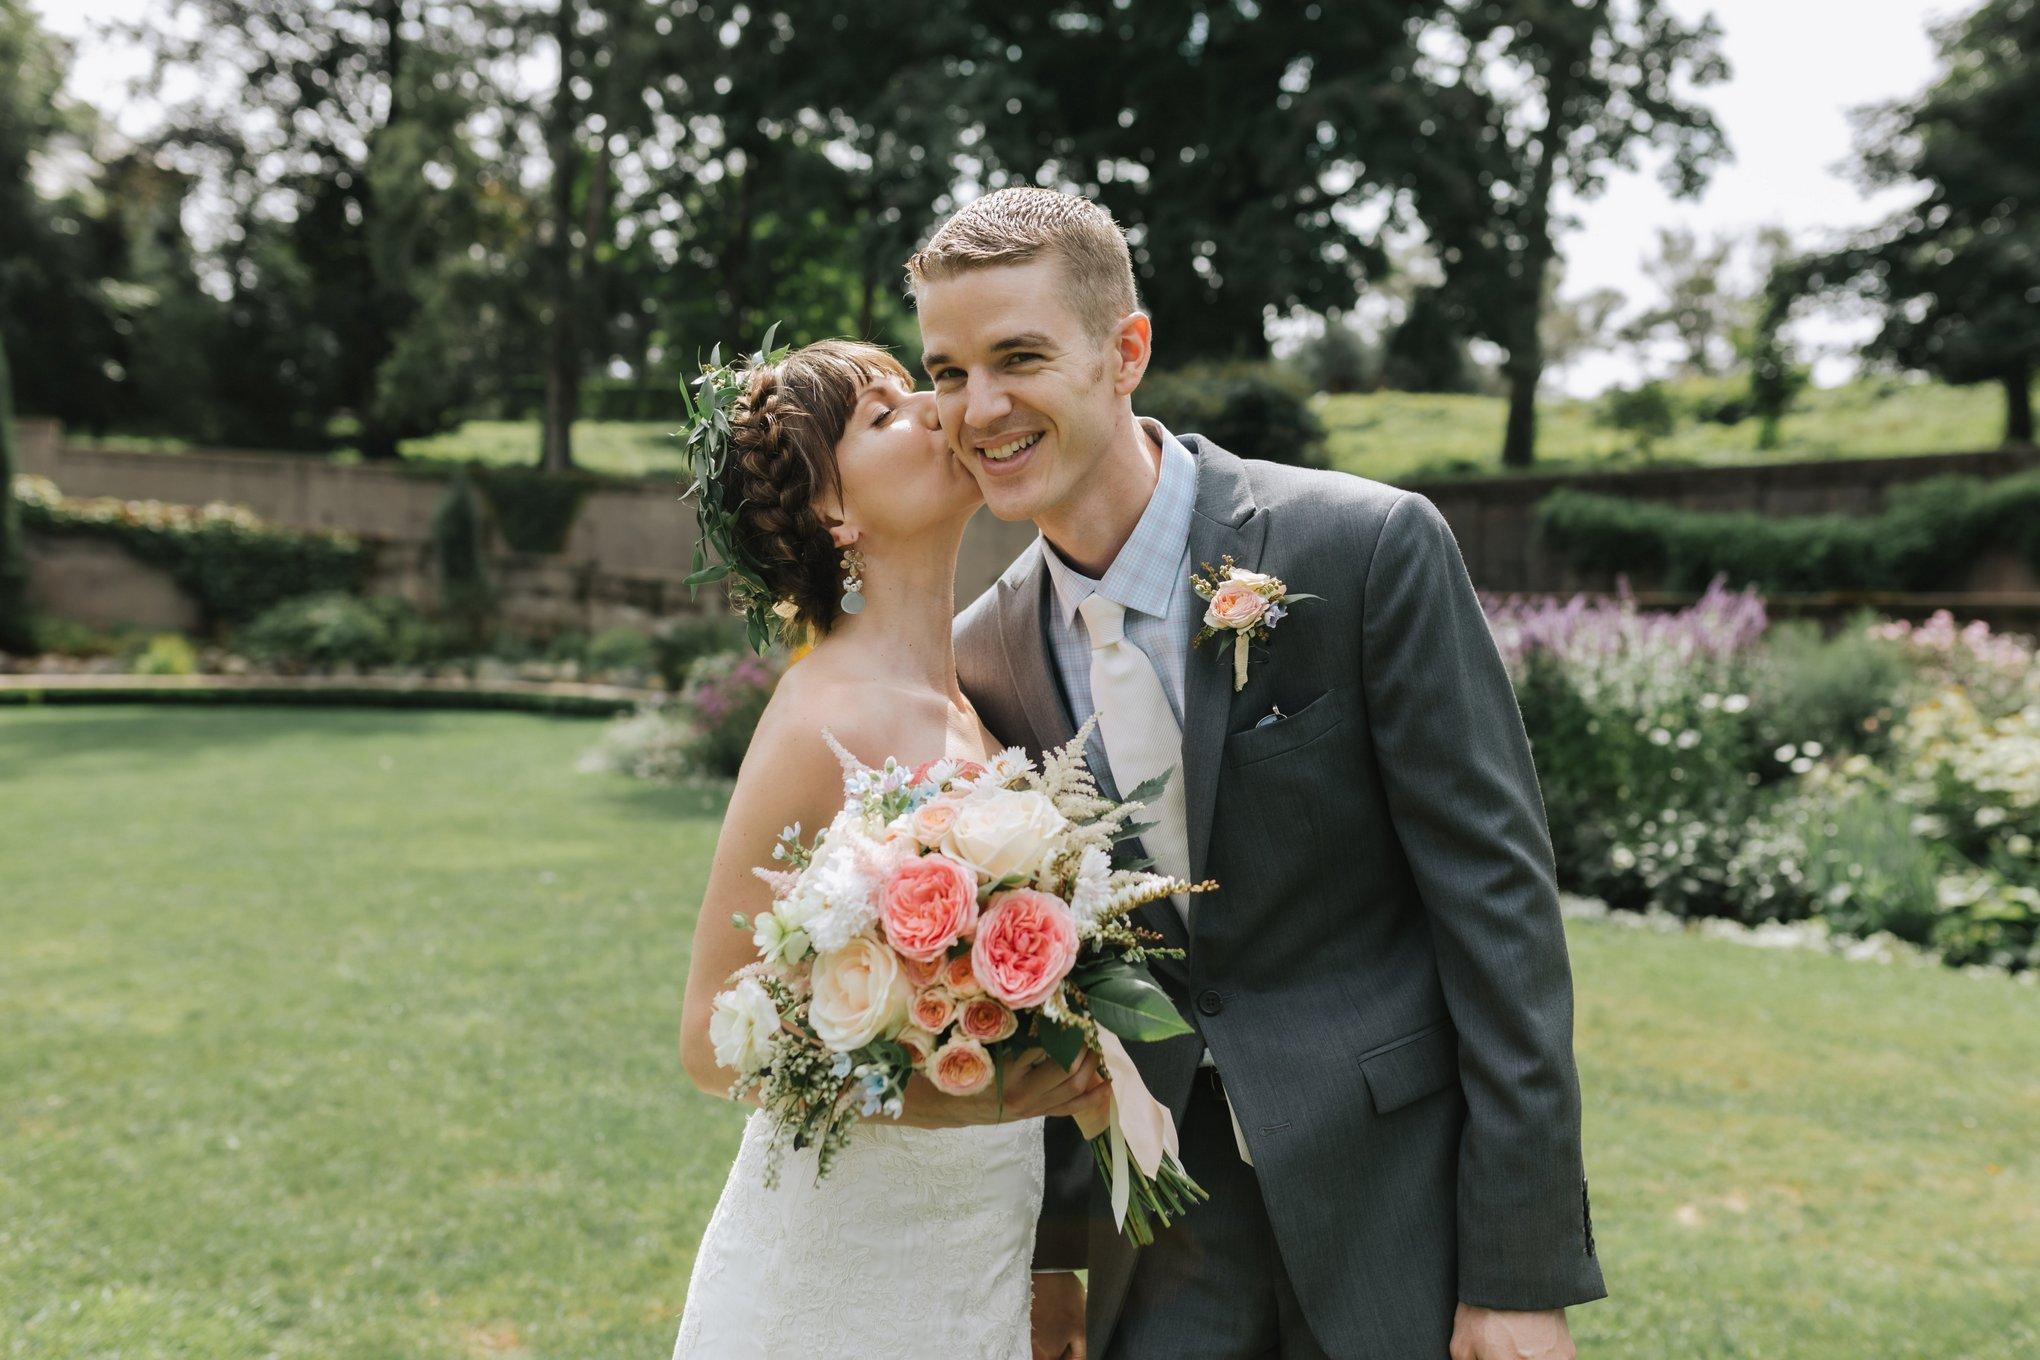 Crane-Estate-Vow-Renewal-Wedding-10.JPG